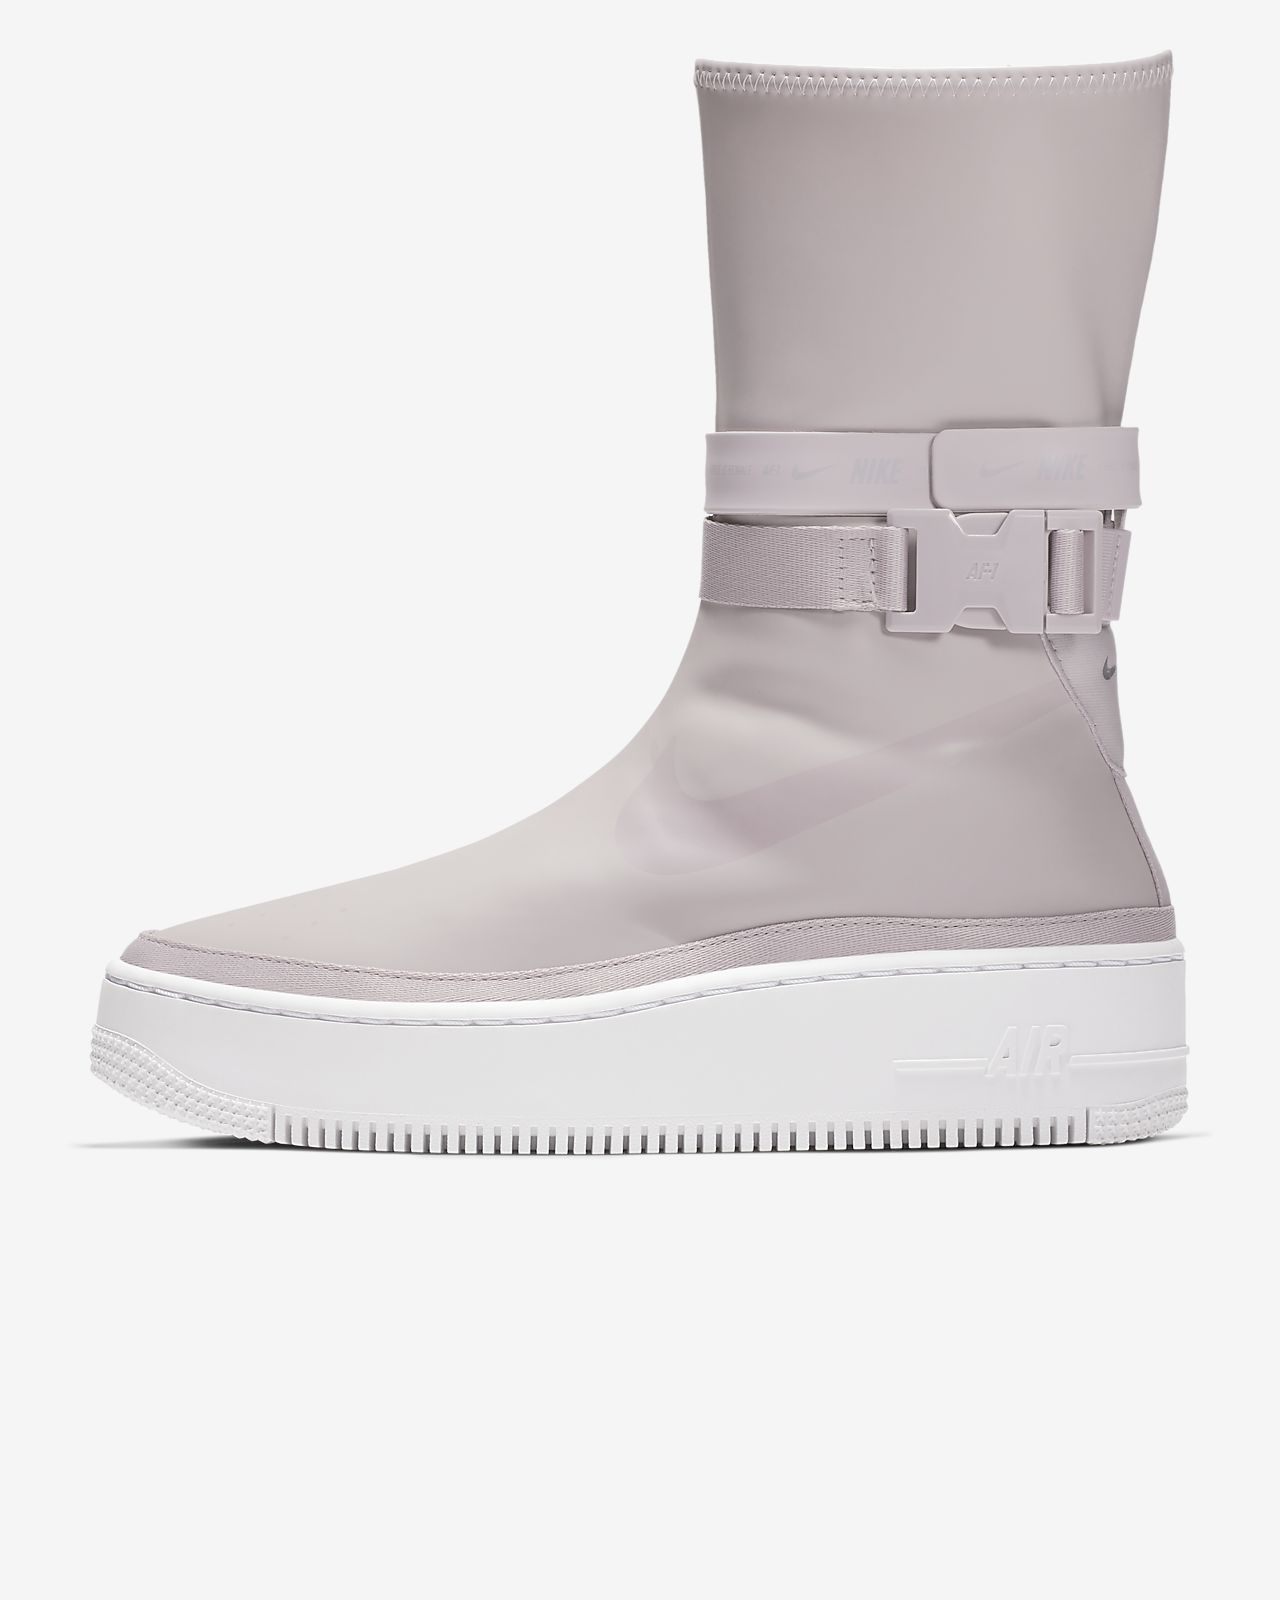 Nike Air Force 1 Sage Low. ekkor: 2019